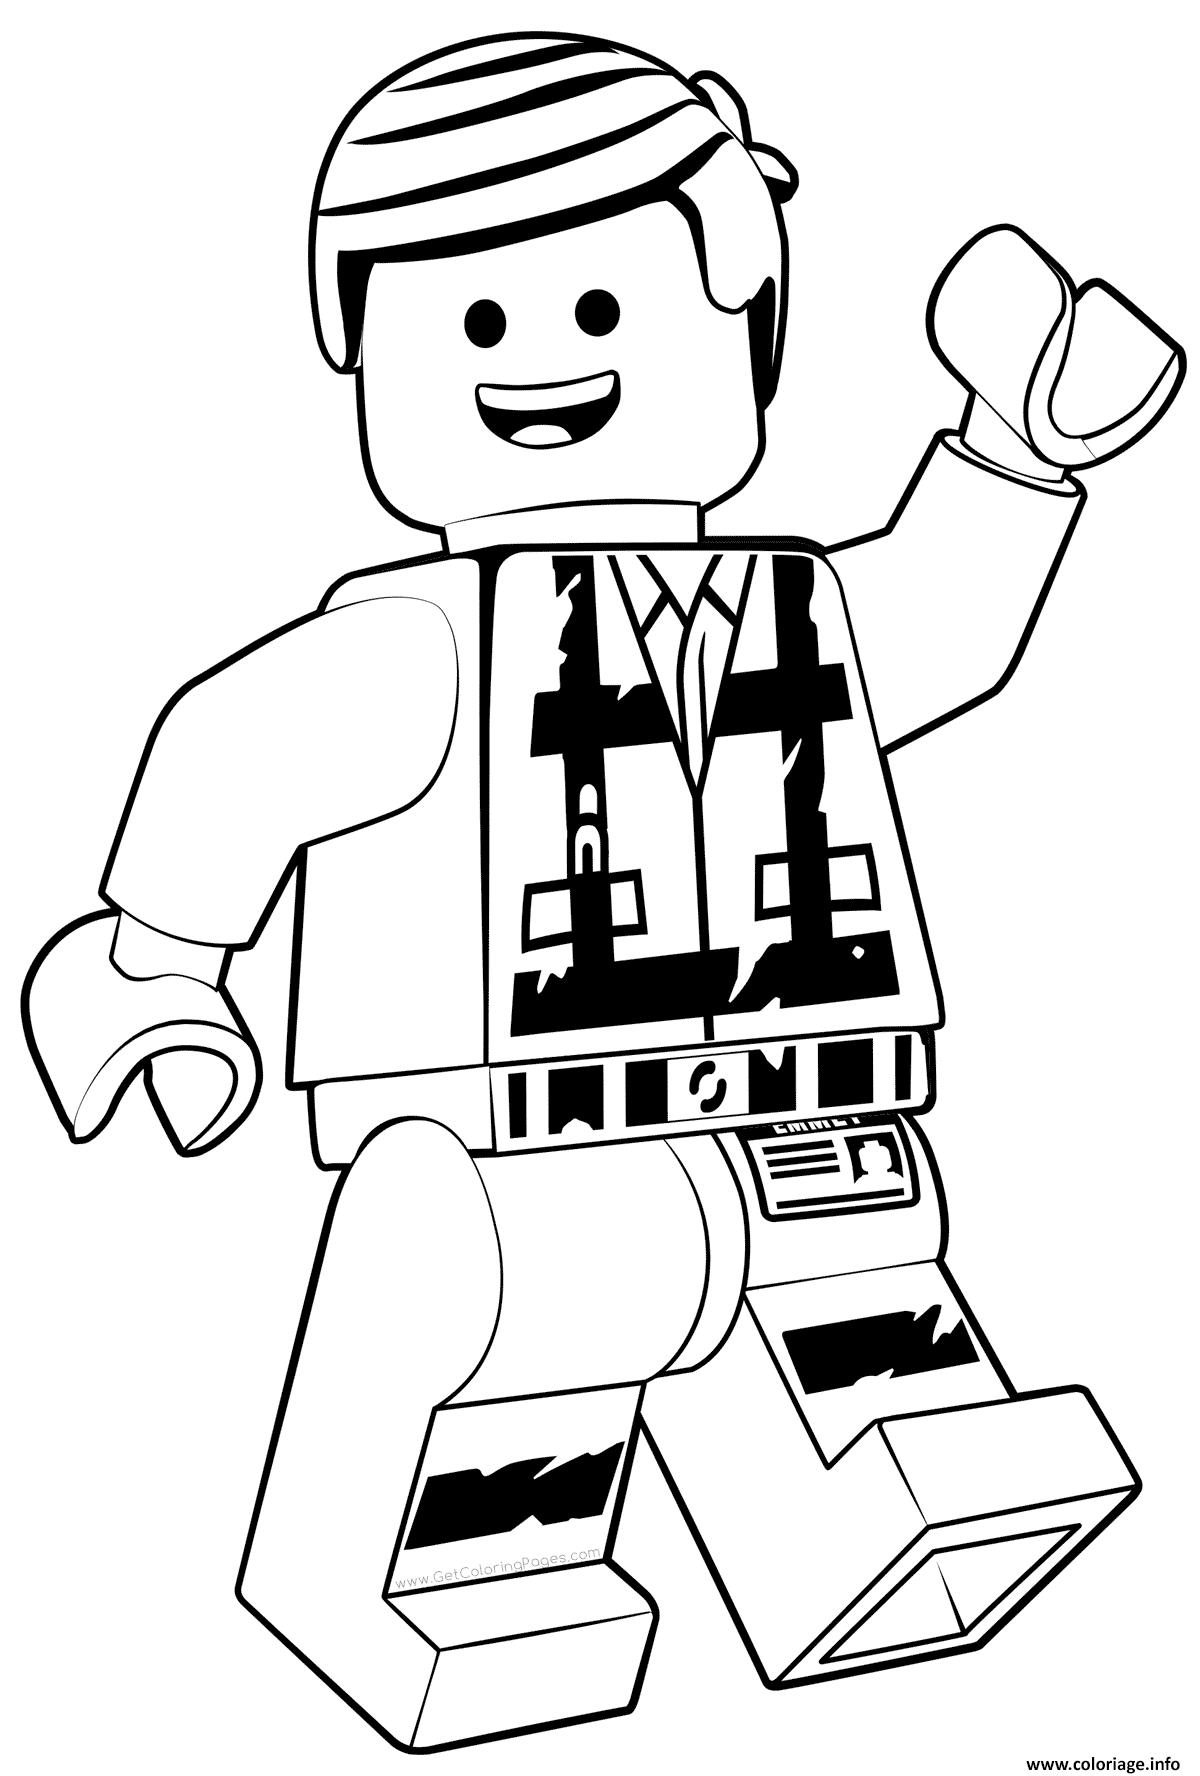 Coloriage LEGO Emmet La Grande Aventure 2 Dessin Lego à imprimer